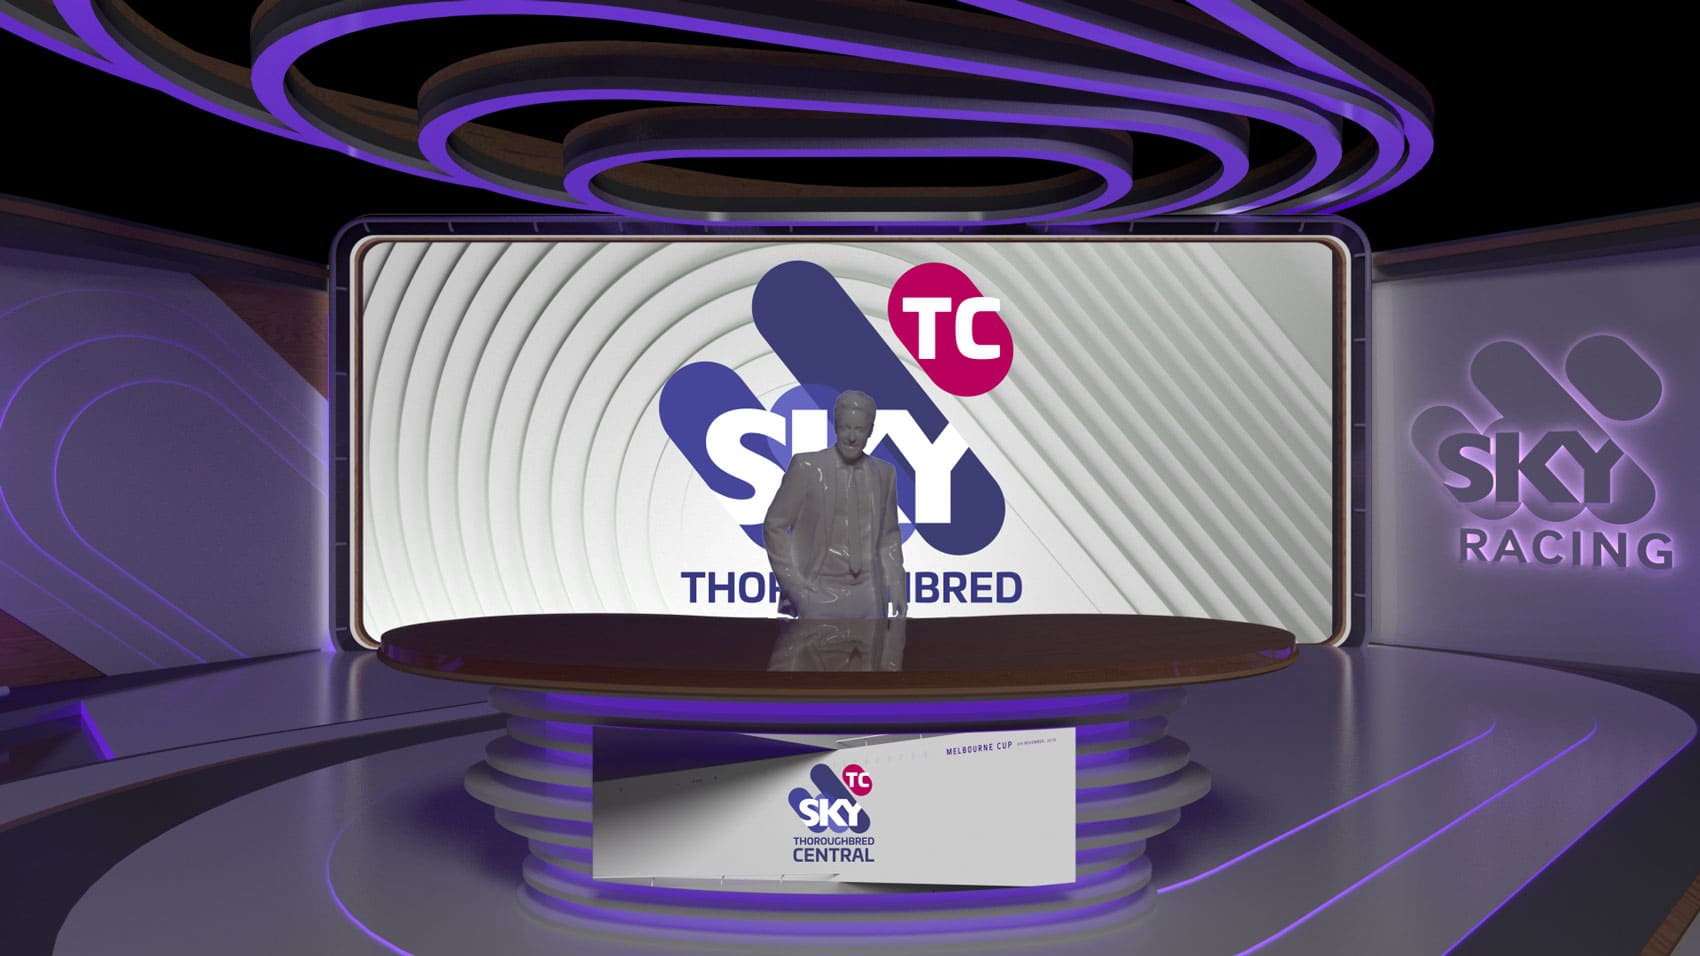 2019 Sky Racing Virtual Set Concept 01 Girraphic